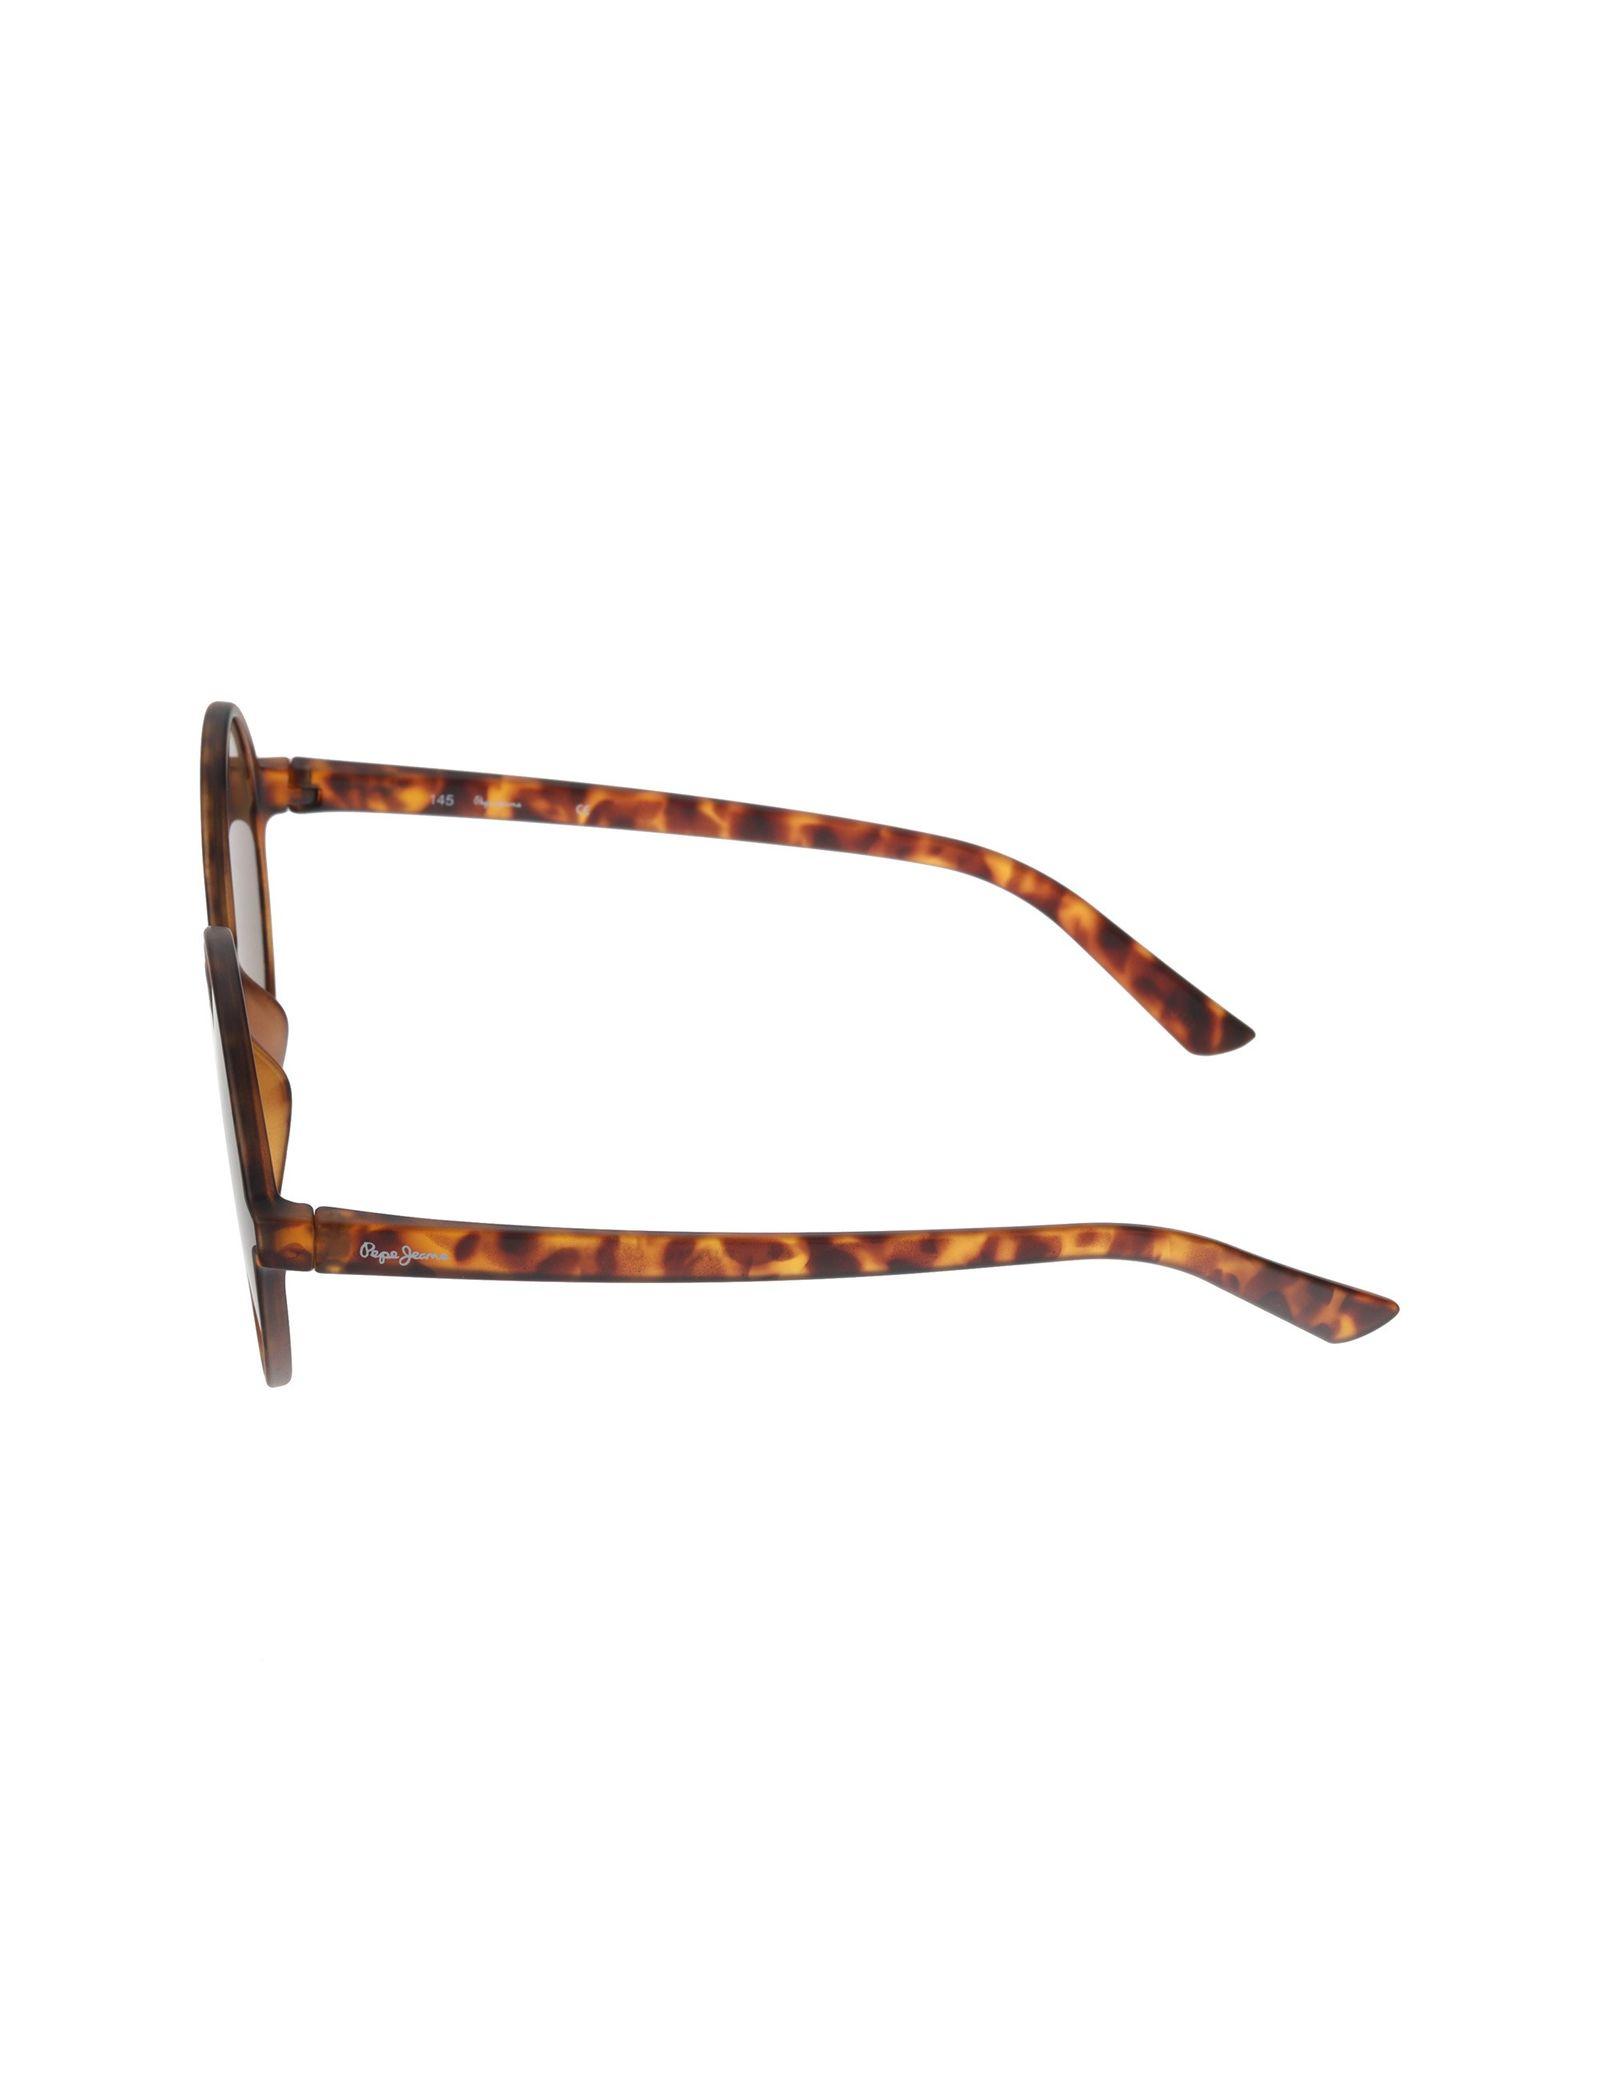 عینک آفتابی گرد زنانه - پپه جینز - قهوه اي  - 3